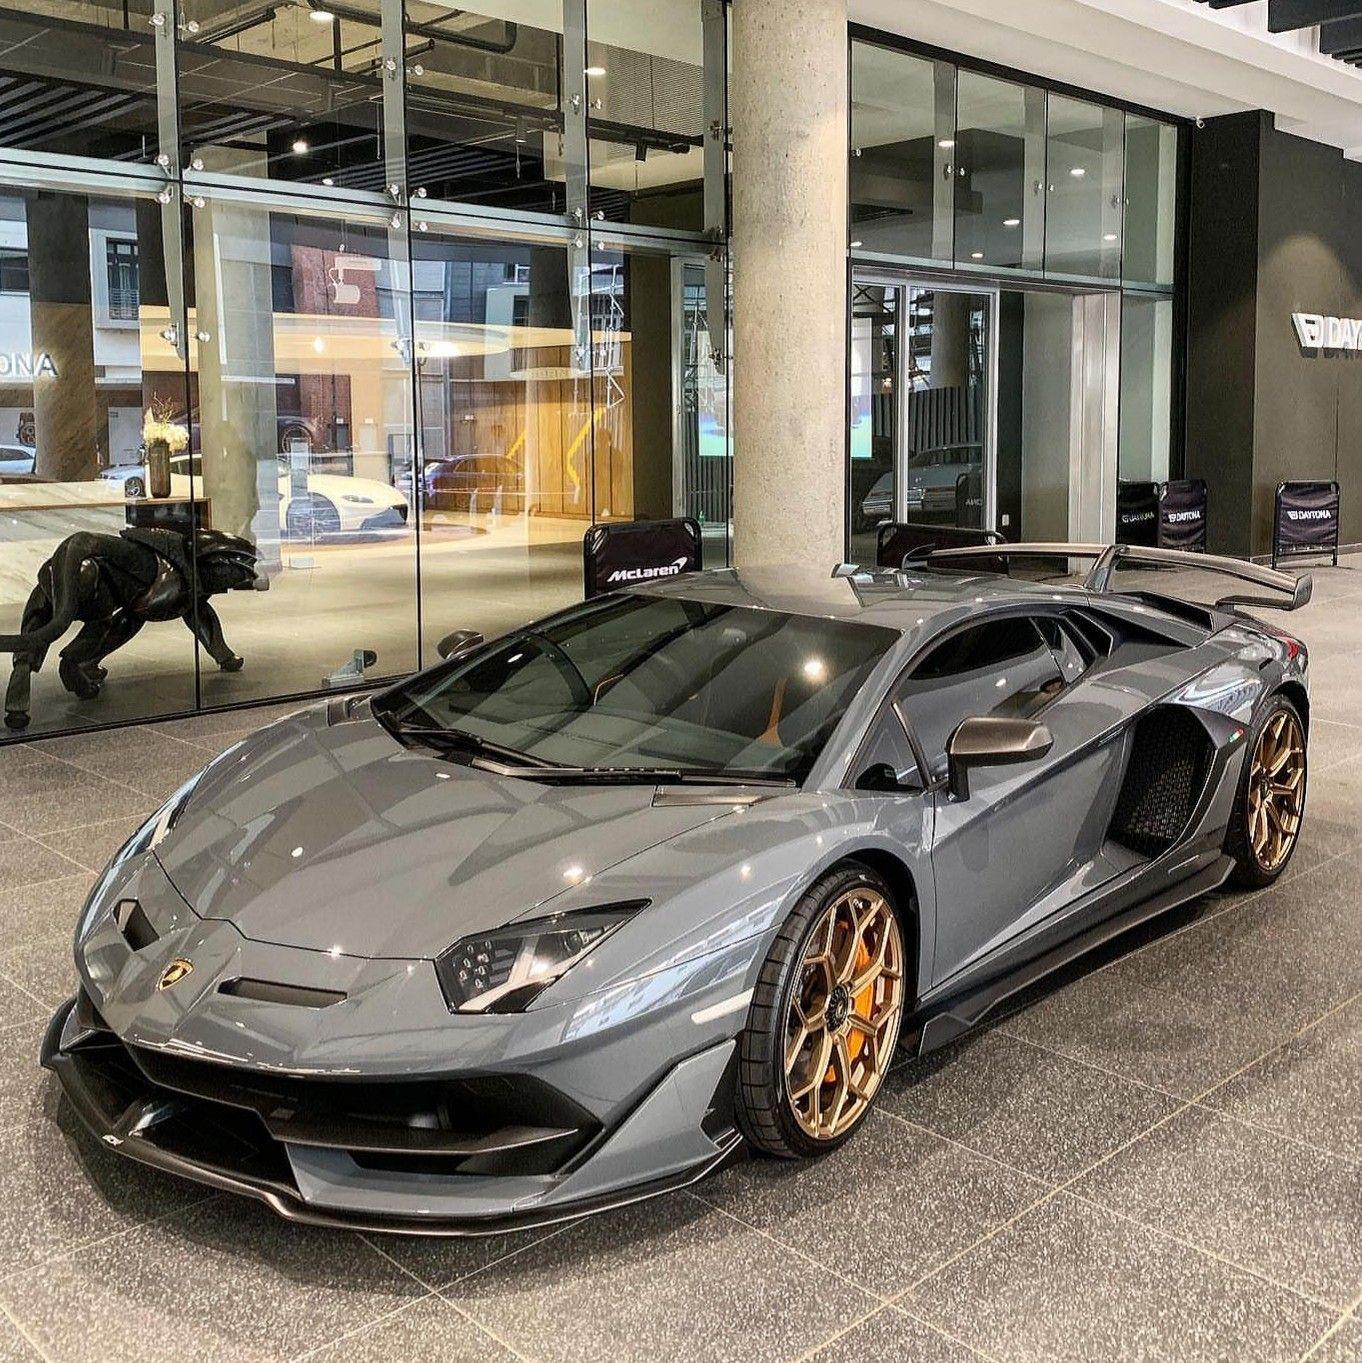 Pin By Finley Mills On Best Luxury Cars In 2020 Lamborghini Aventador Sports Cars Luxury Lamborghini Cars